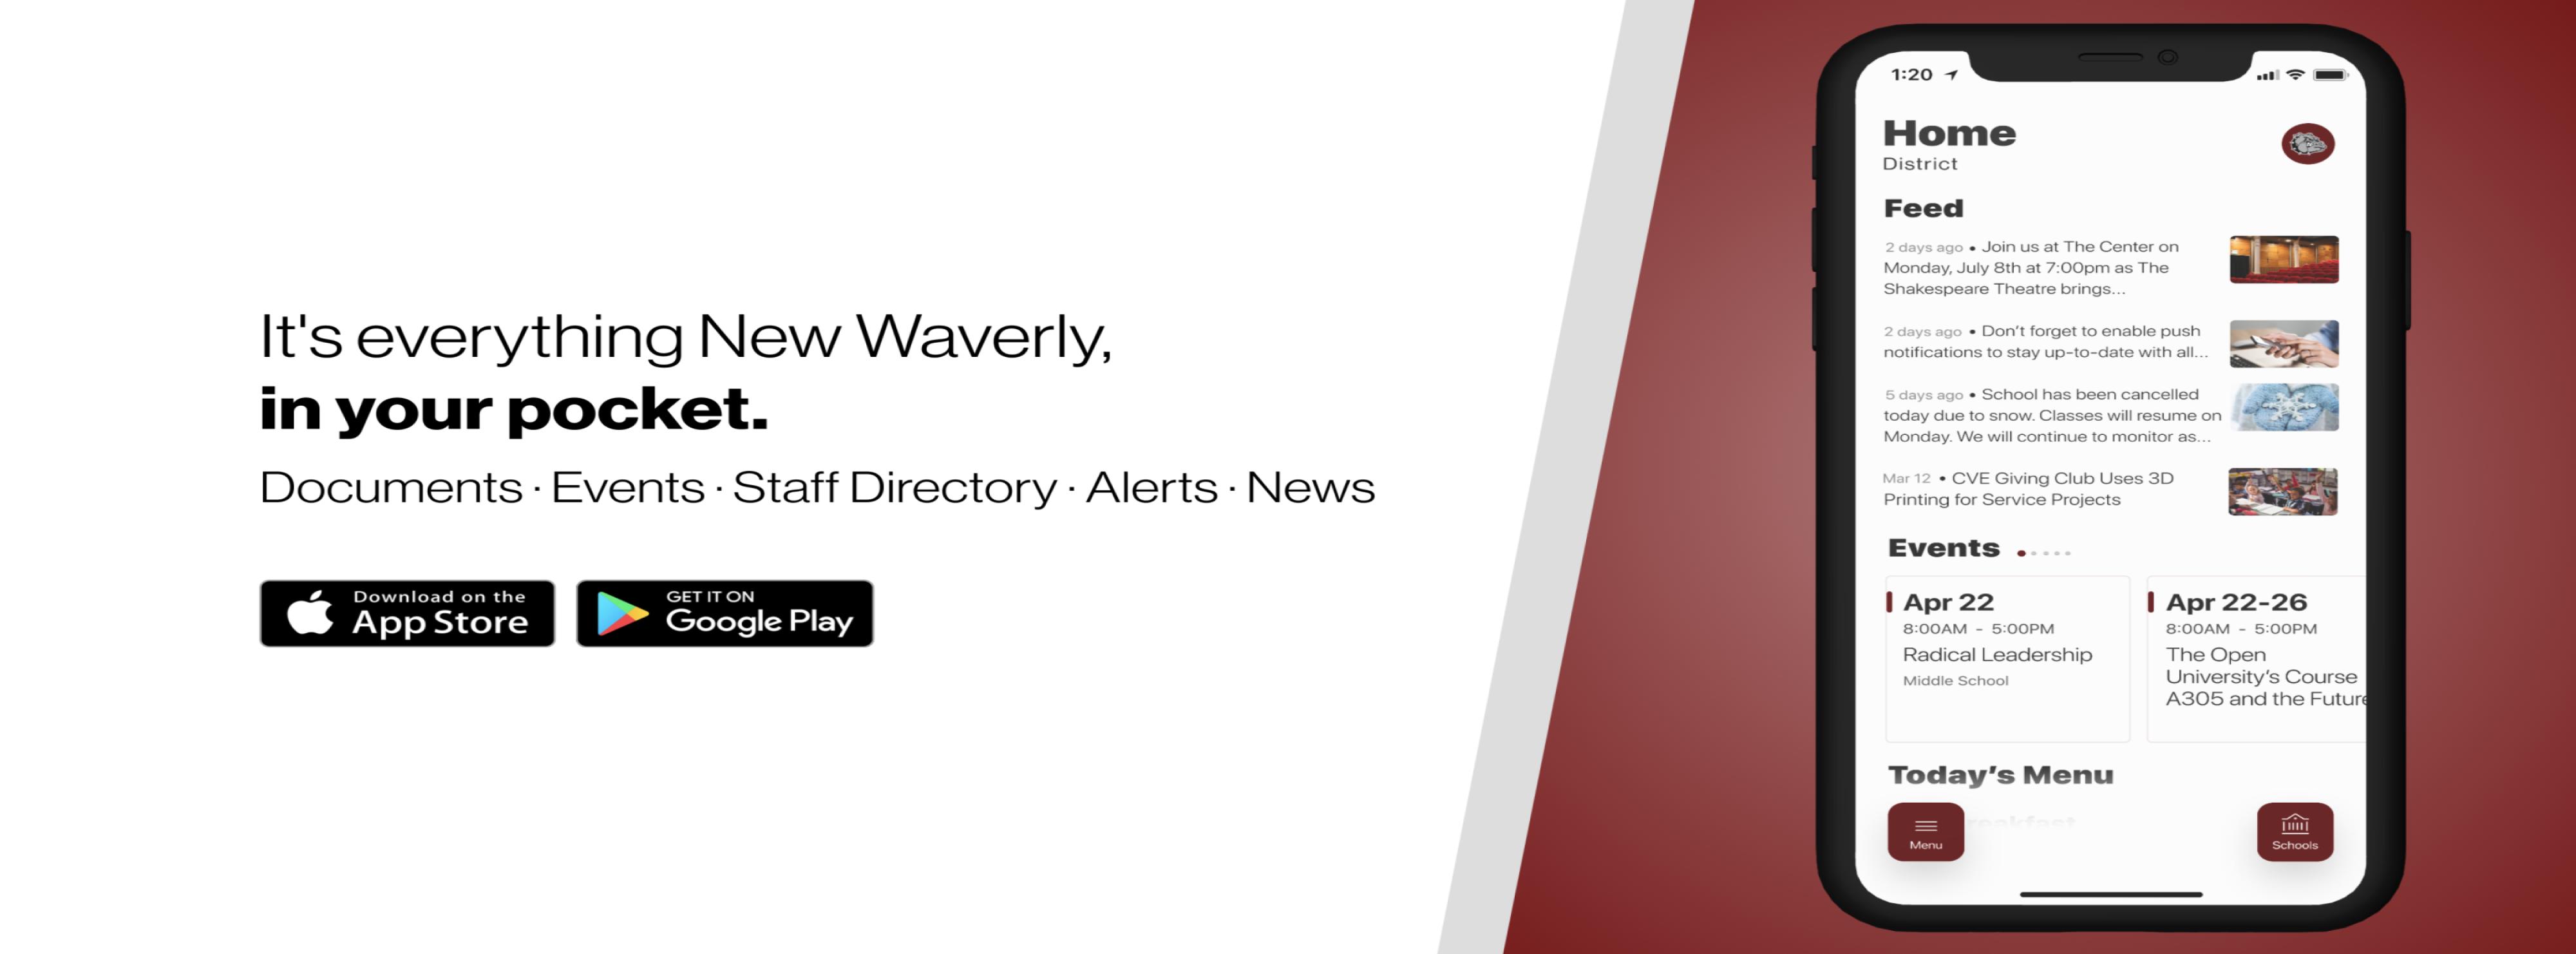 NWISD app updated